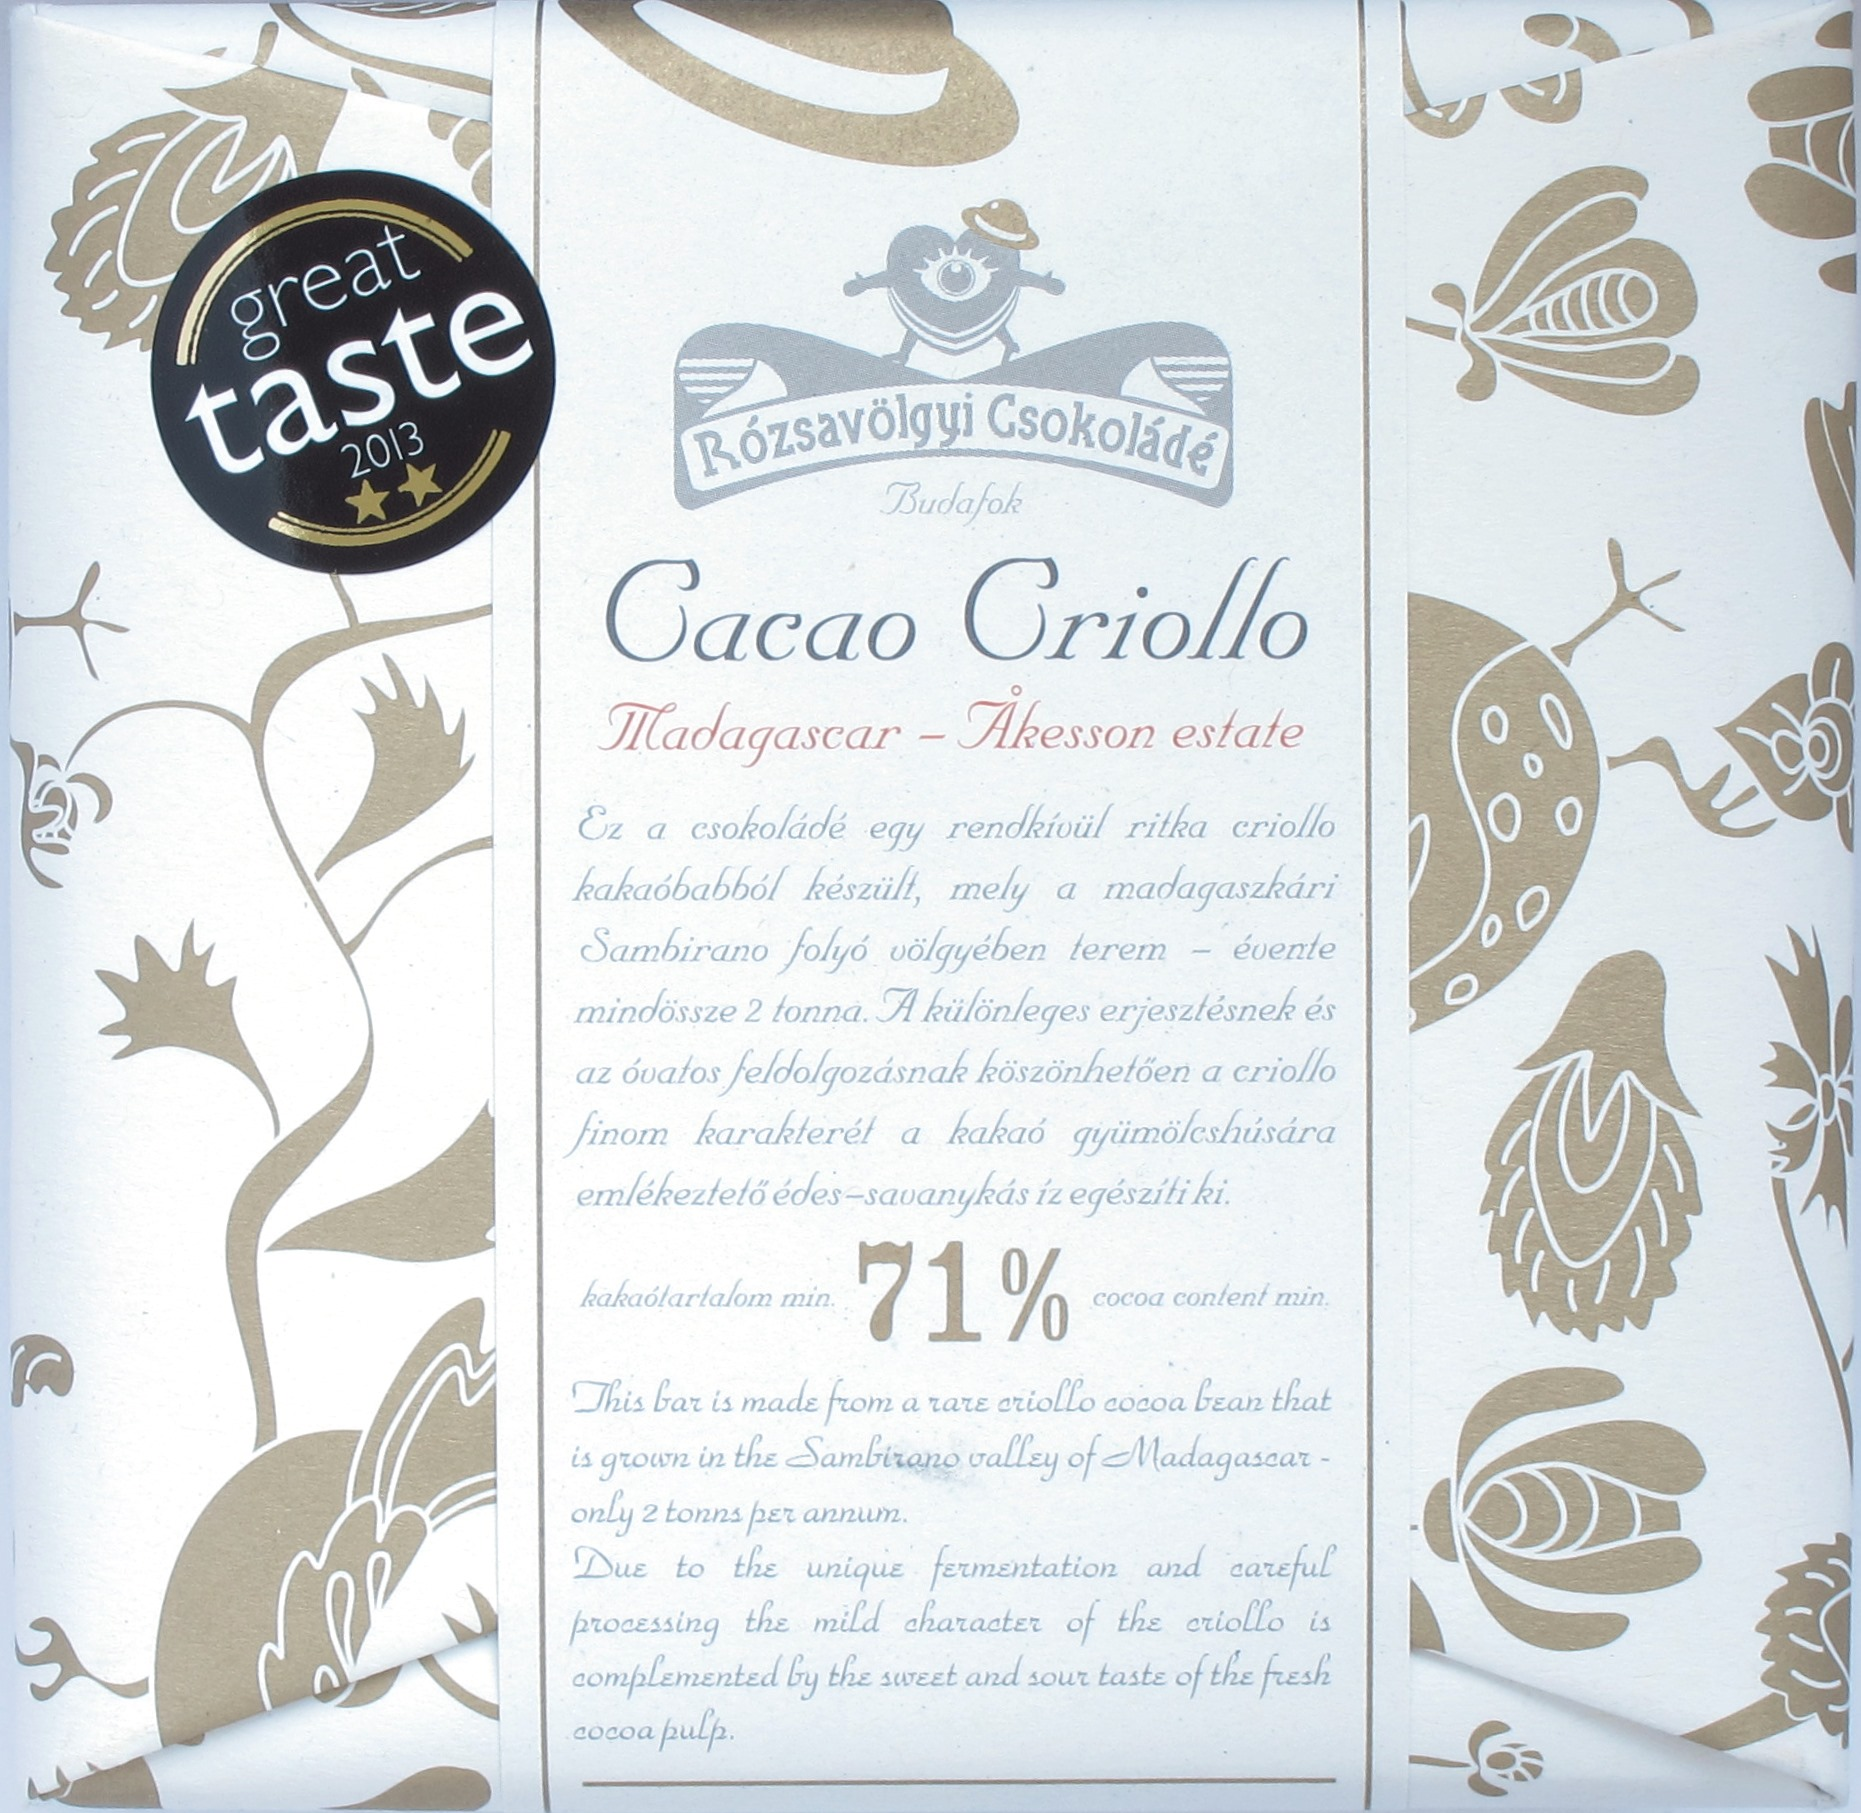 Madagaskar-Schokolade von Rozsavolgyi Csokolade